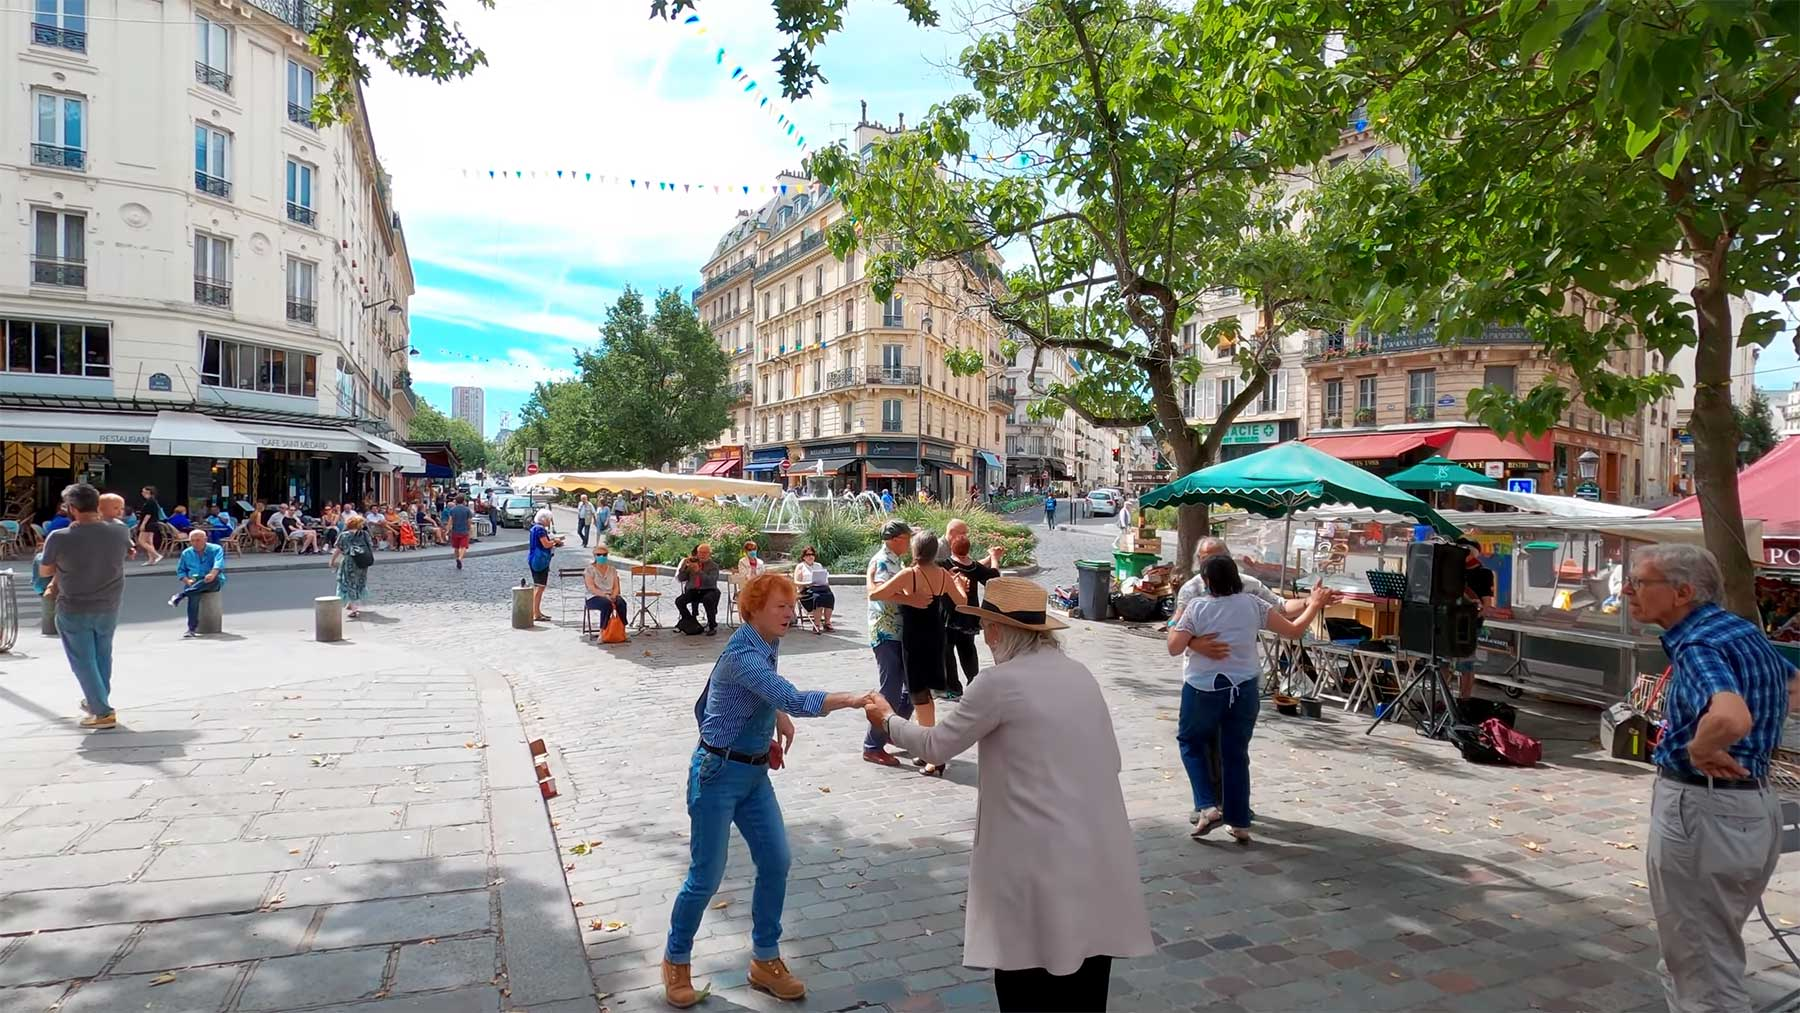 5-stündiger Videospaziergang durch Paris